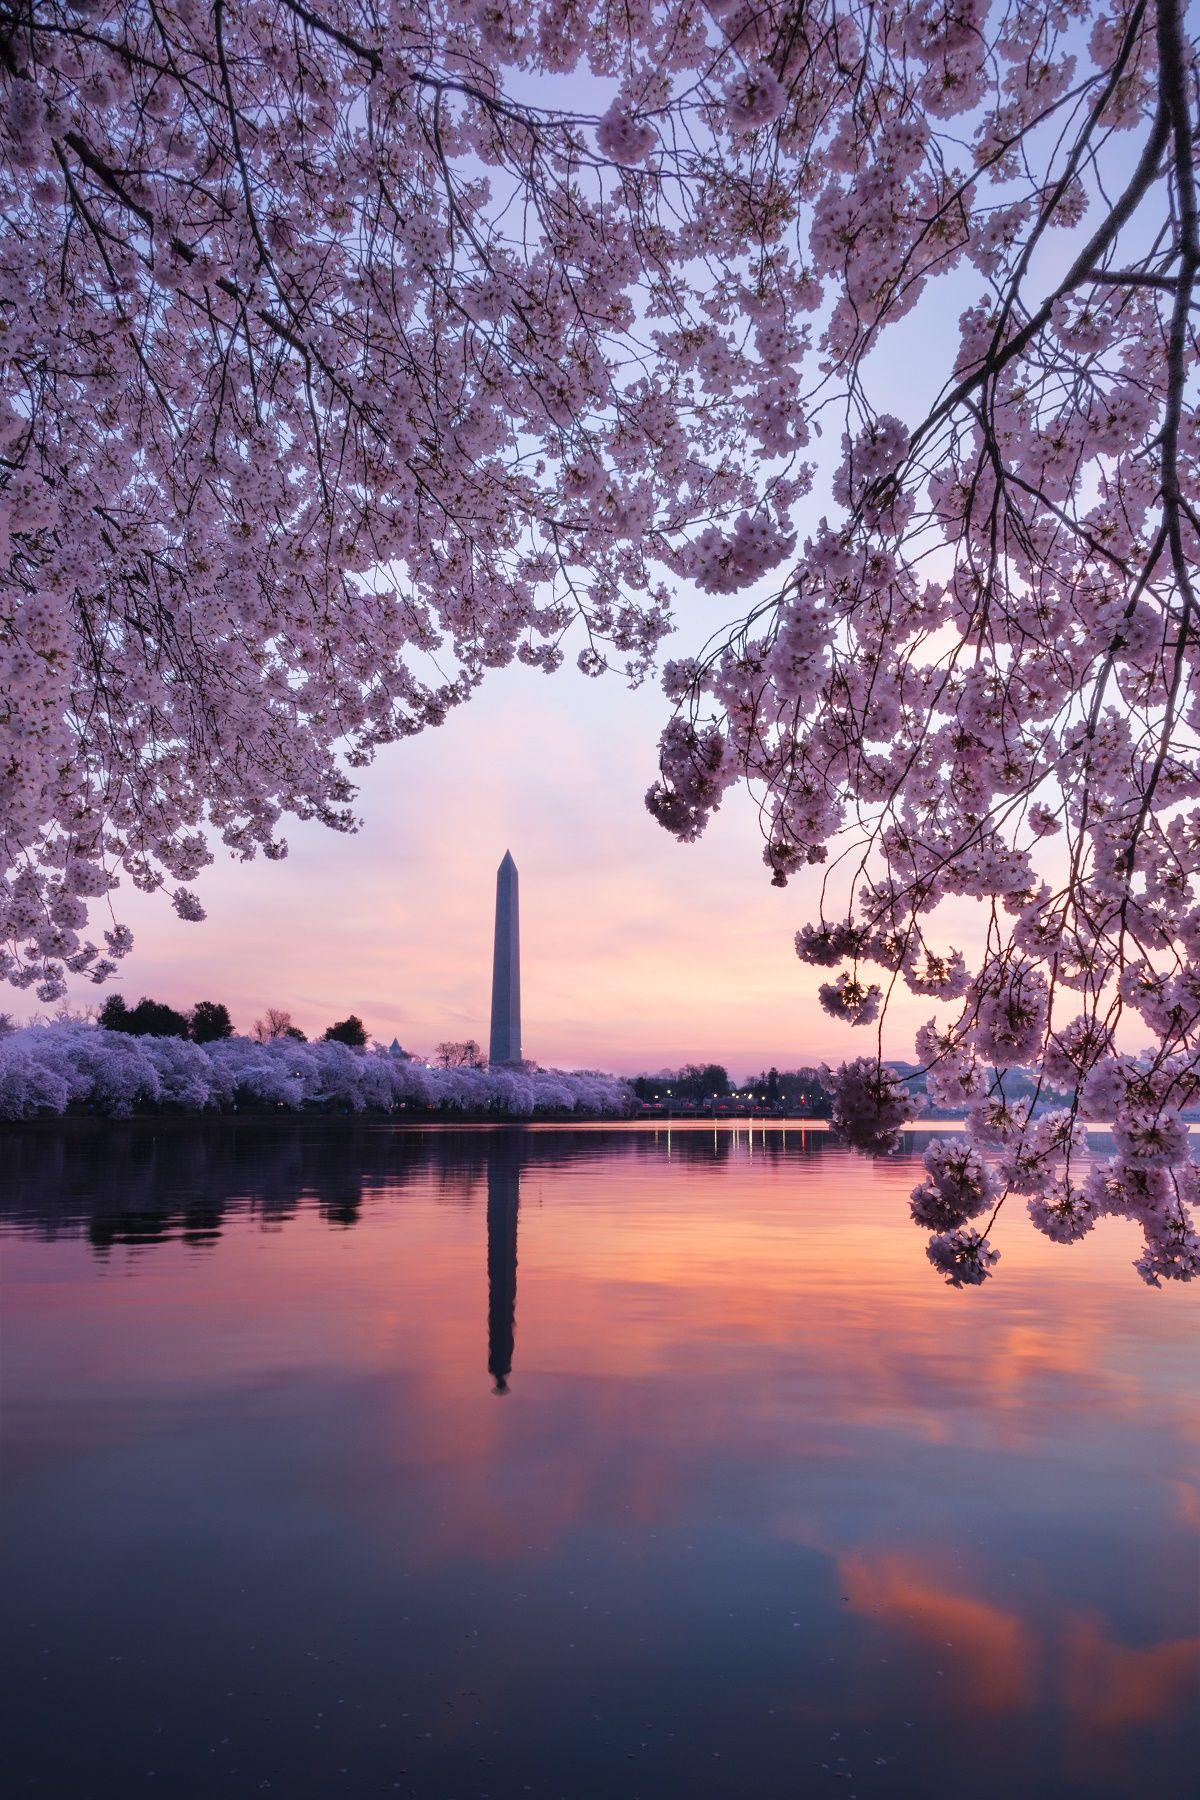 How To Experience Cherry Blossom Season In Washington Dc Cherry Blossom Art Washington Dc Tourism Washington Dc Travel